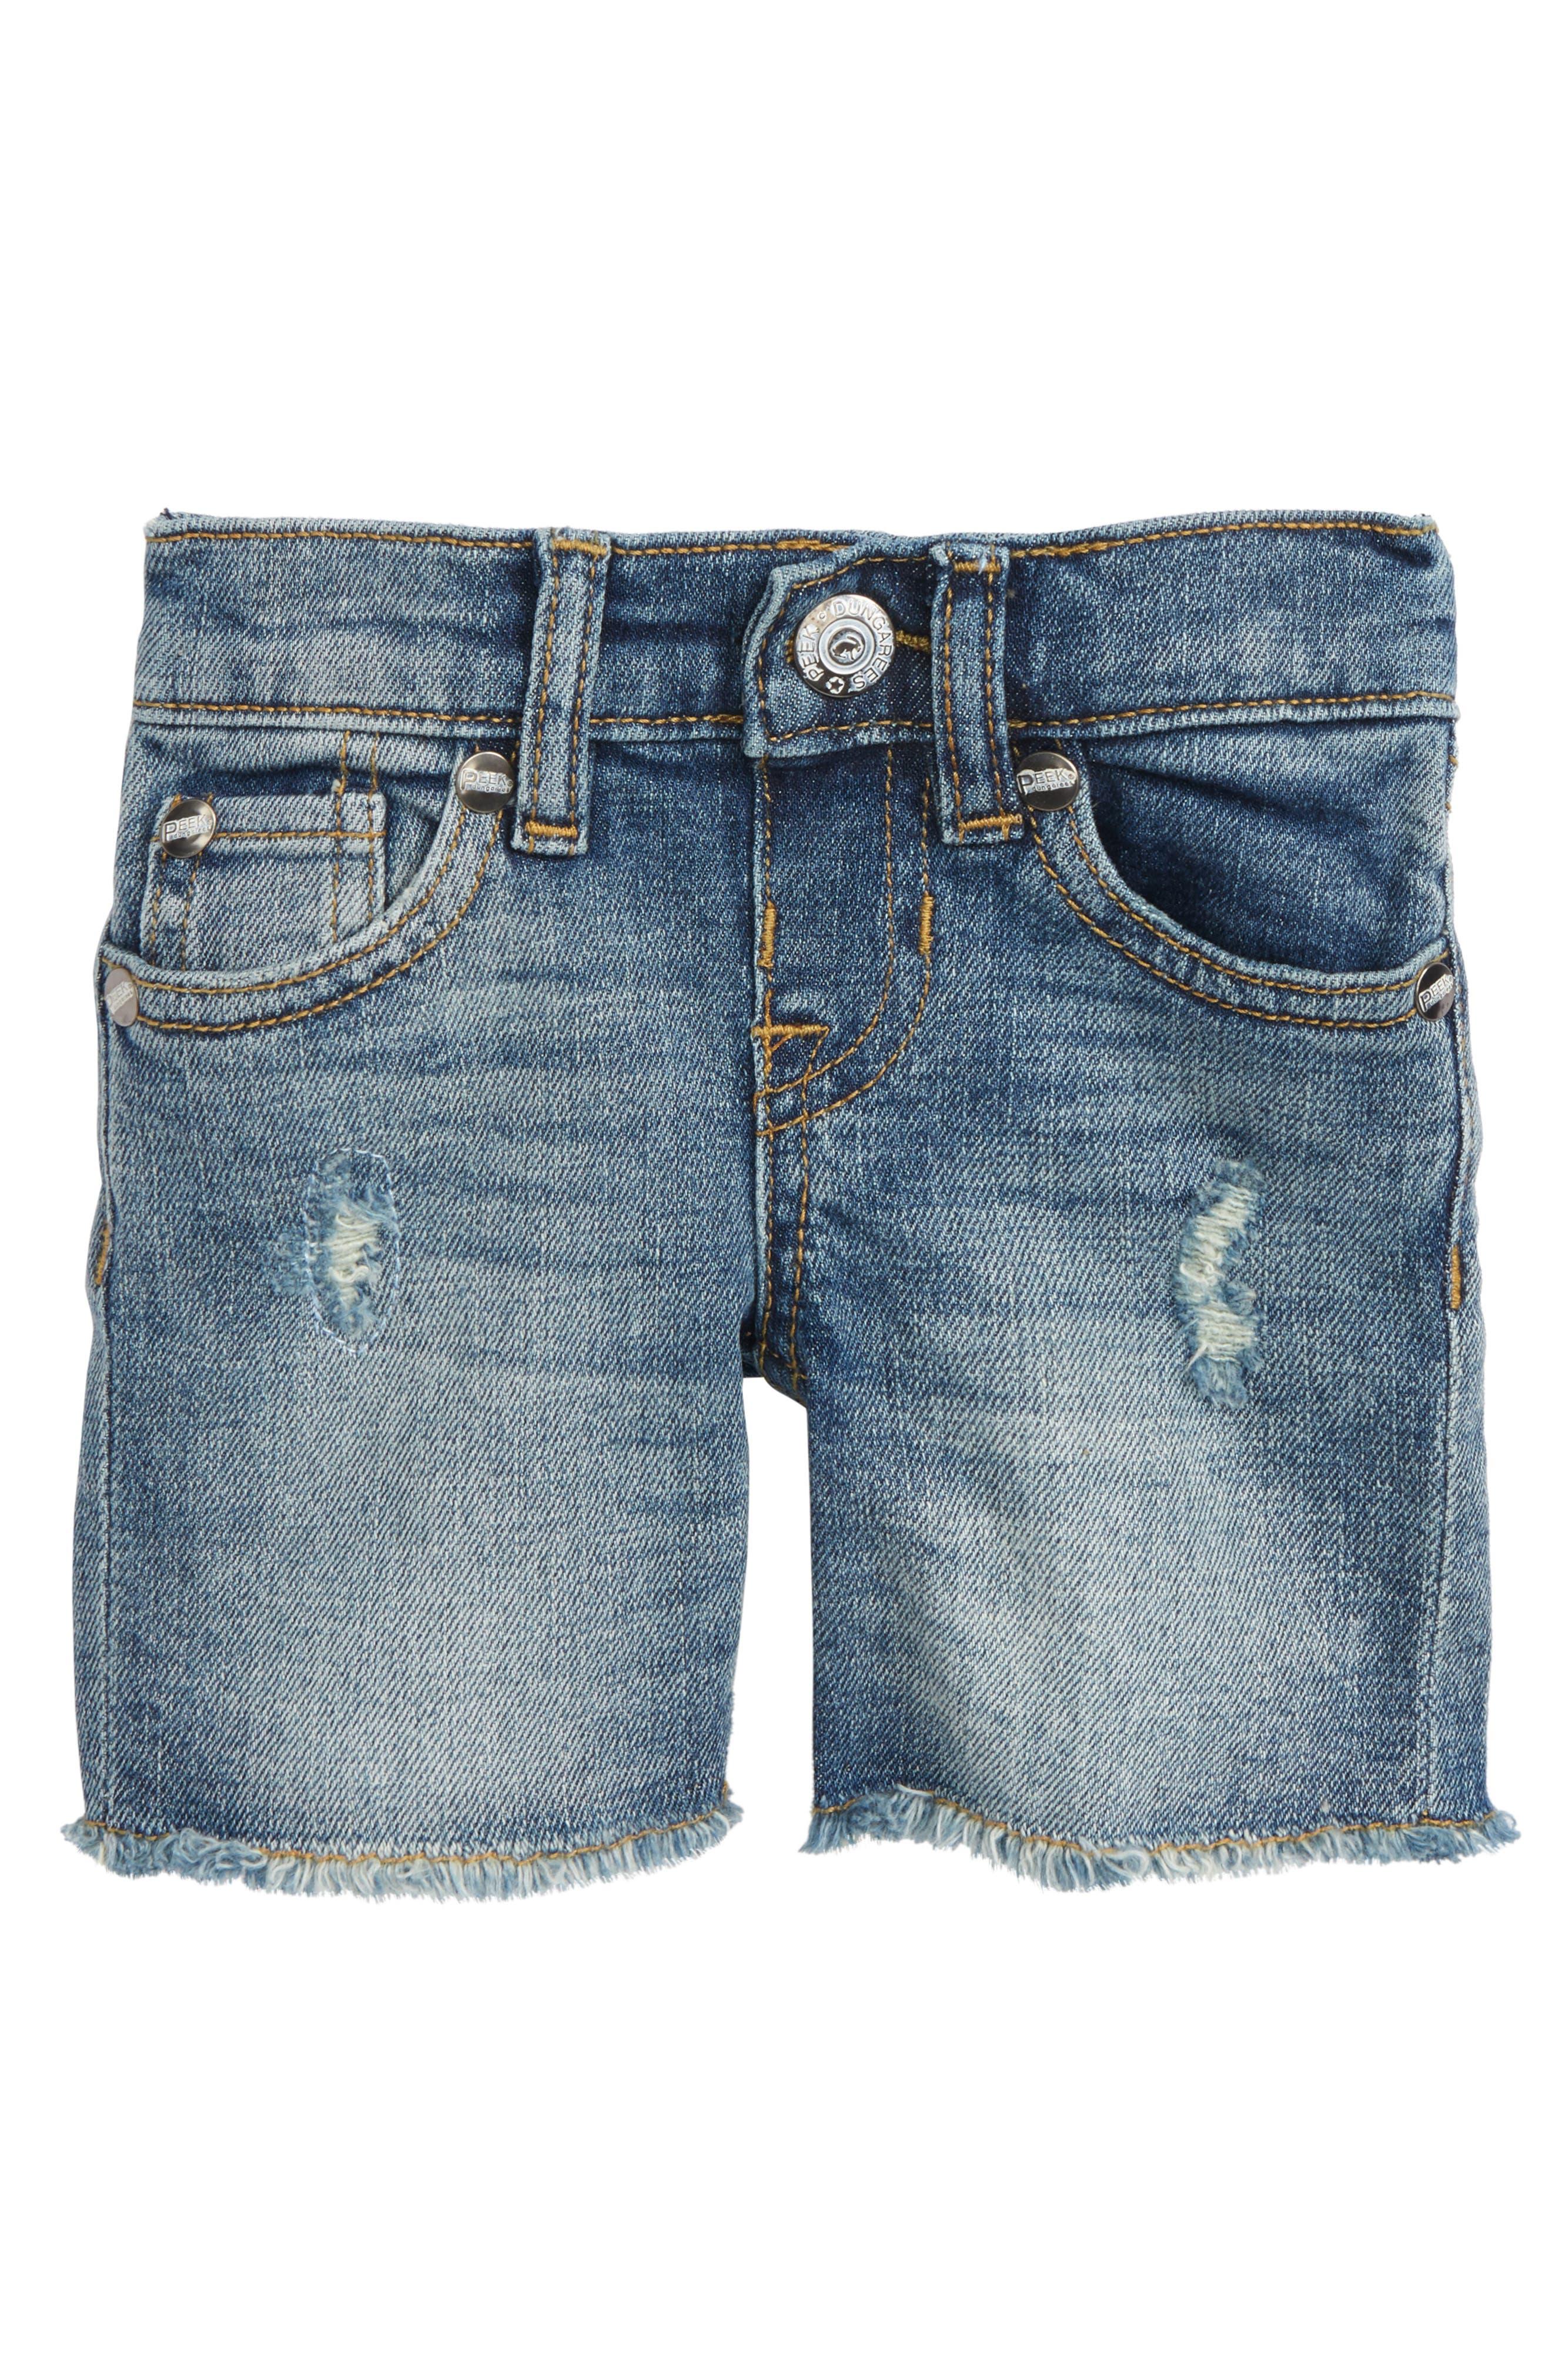 PEEK AREN'T YOU CURIOUS Peek Fairfax Denim Shorts, Main, color, 400